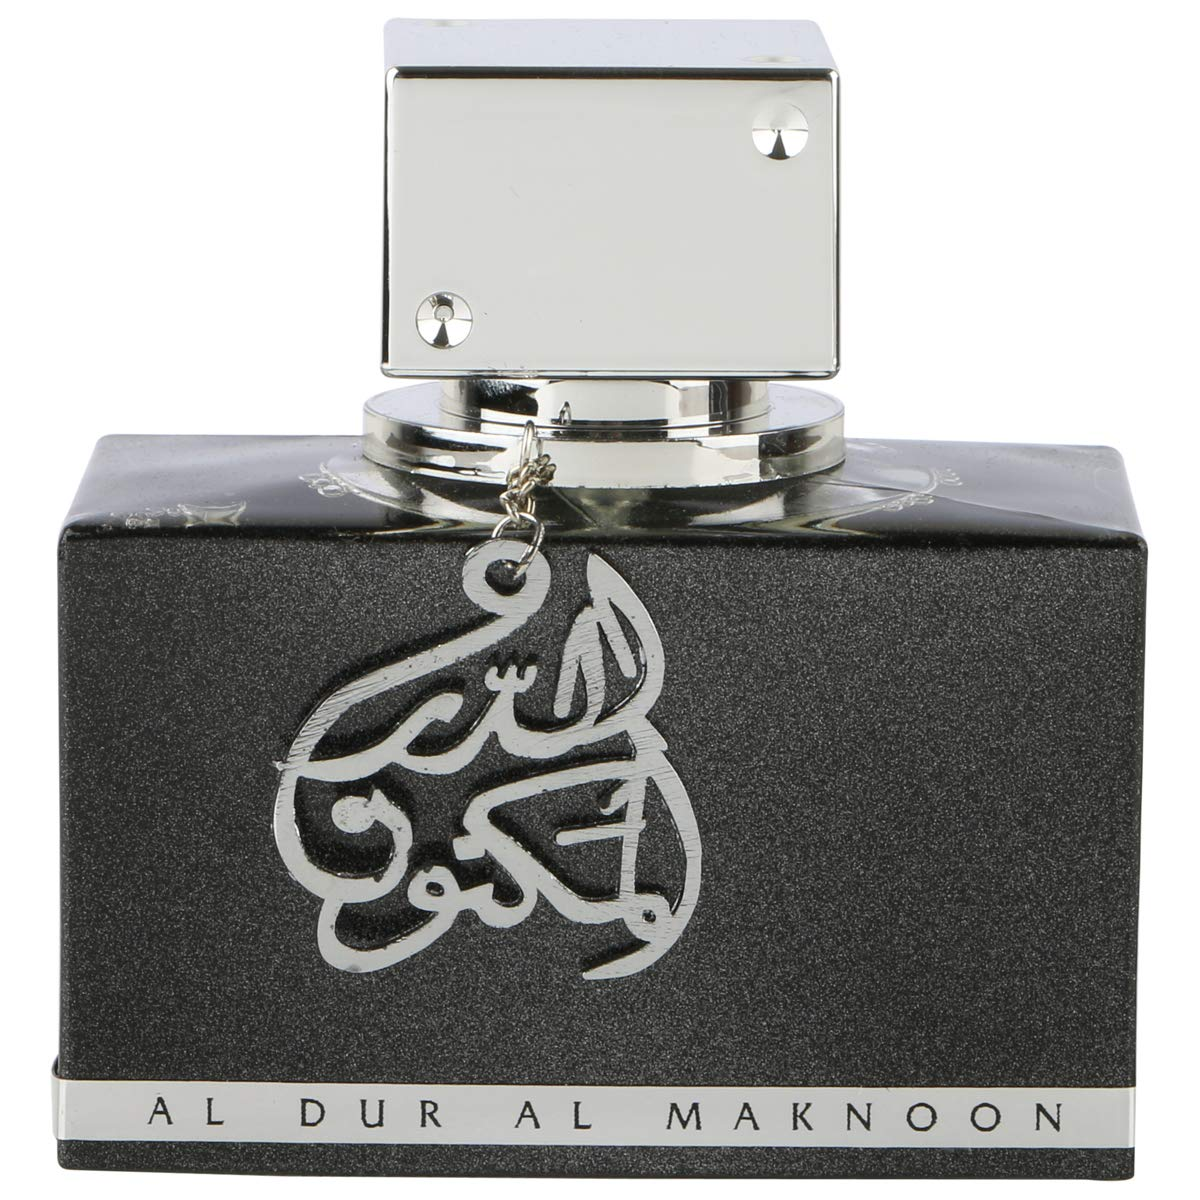 Al Dur Al Maknoon Silver Jasmine Fruity Patchouli Ambery by Lattafa 100ml EDP